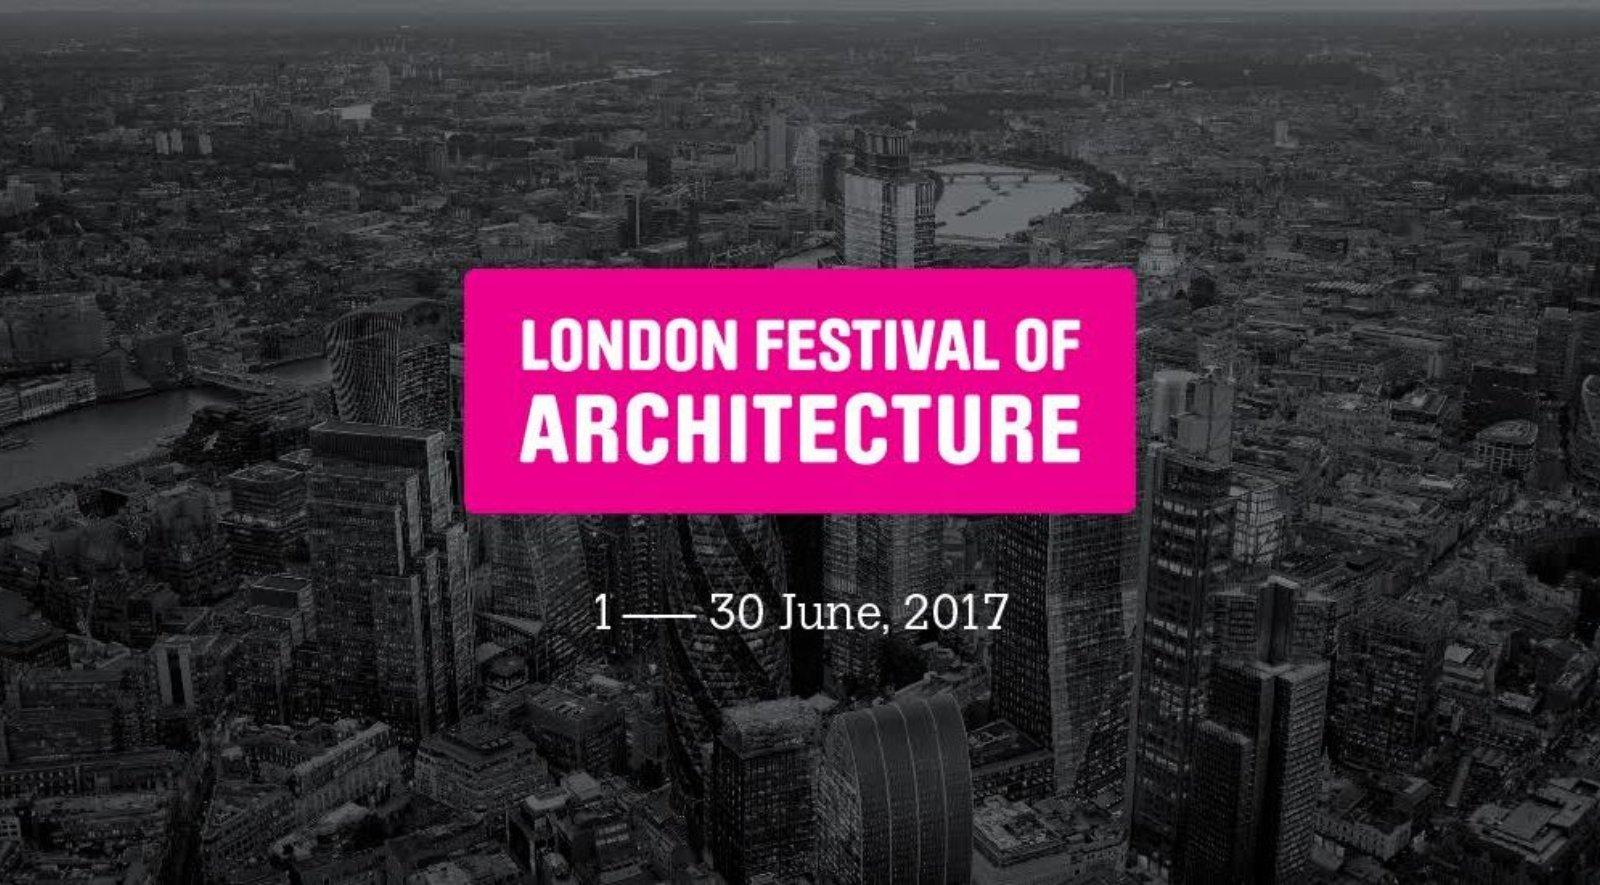 London Festival of Architecture 2017